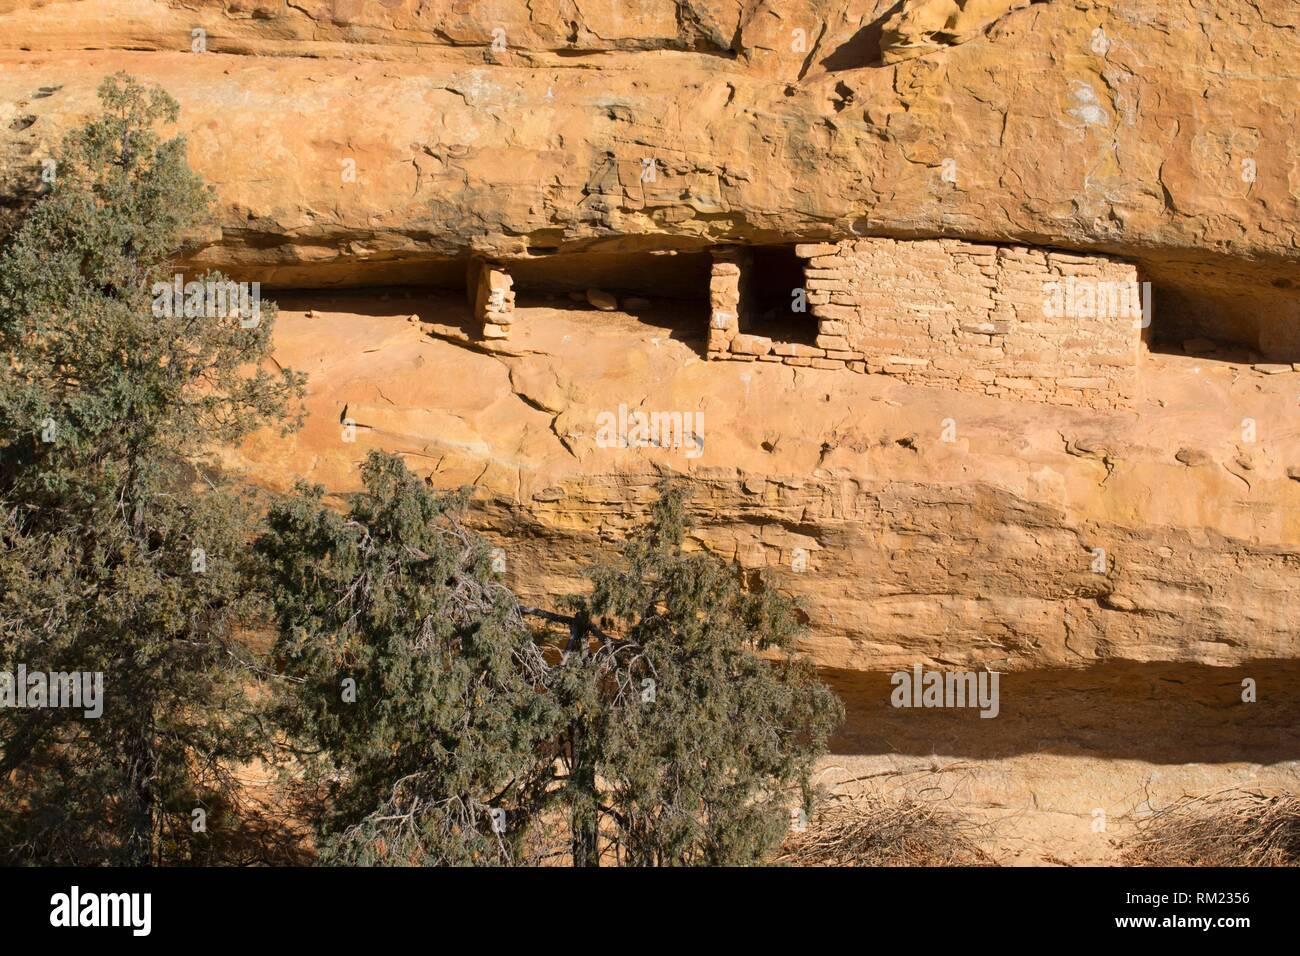 Cliff ruin near Spruce Tree House, Mesa Verde National Park, Colorado. - Stock Image